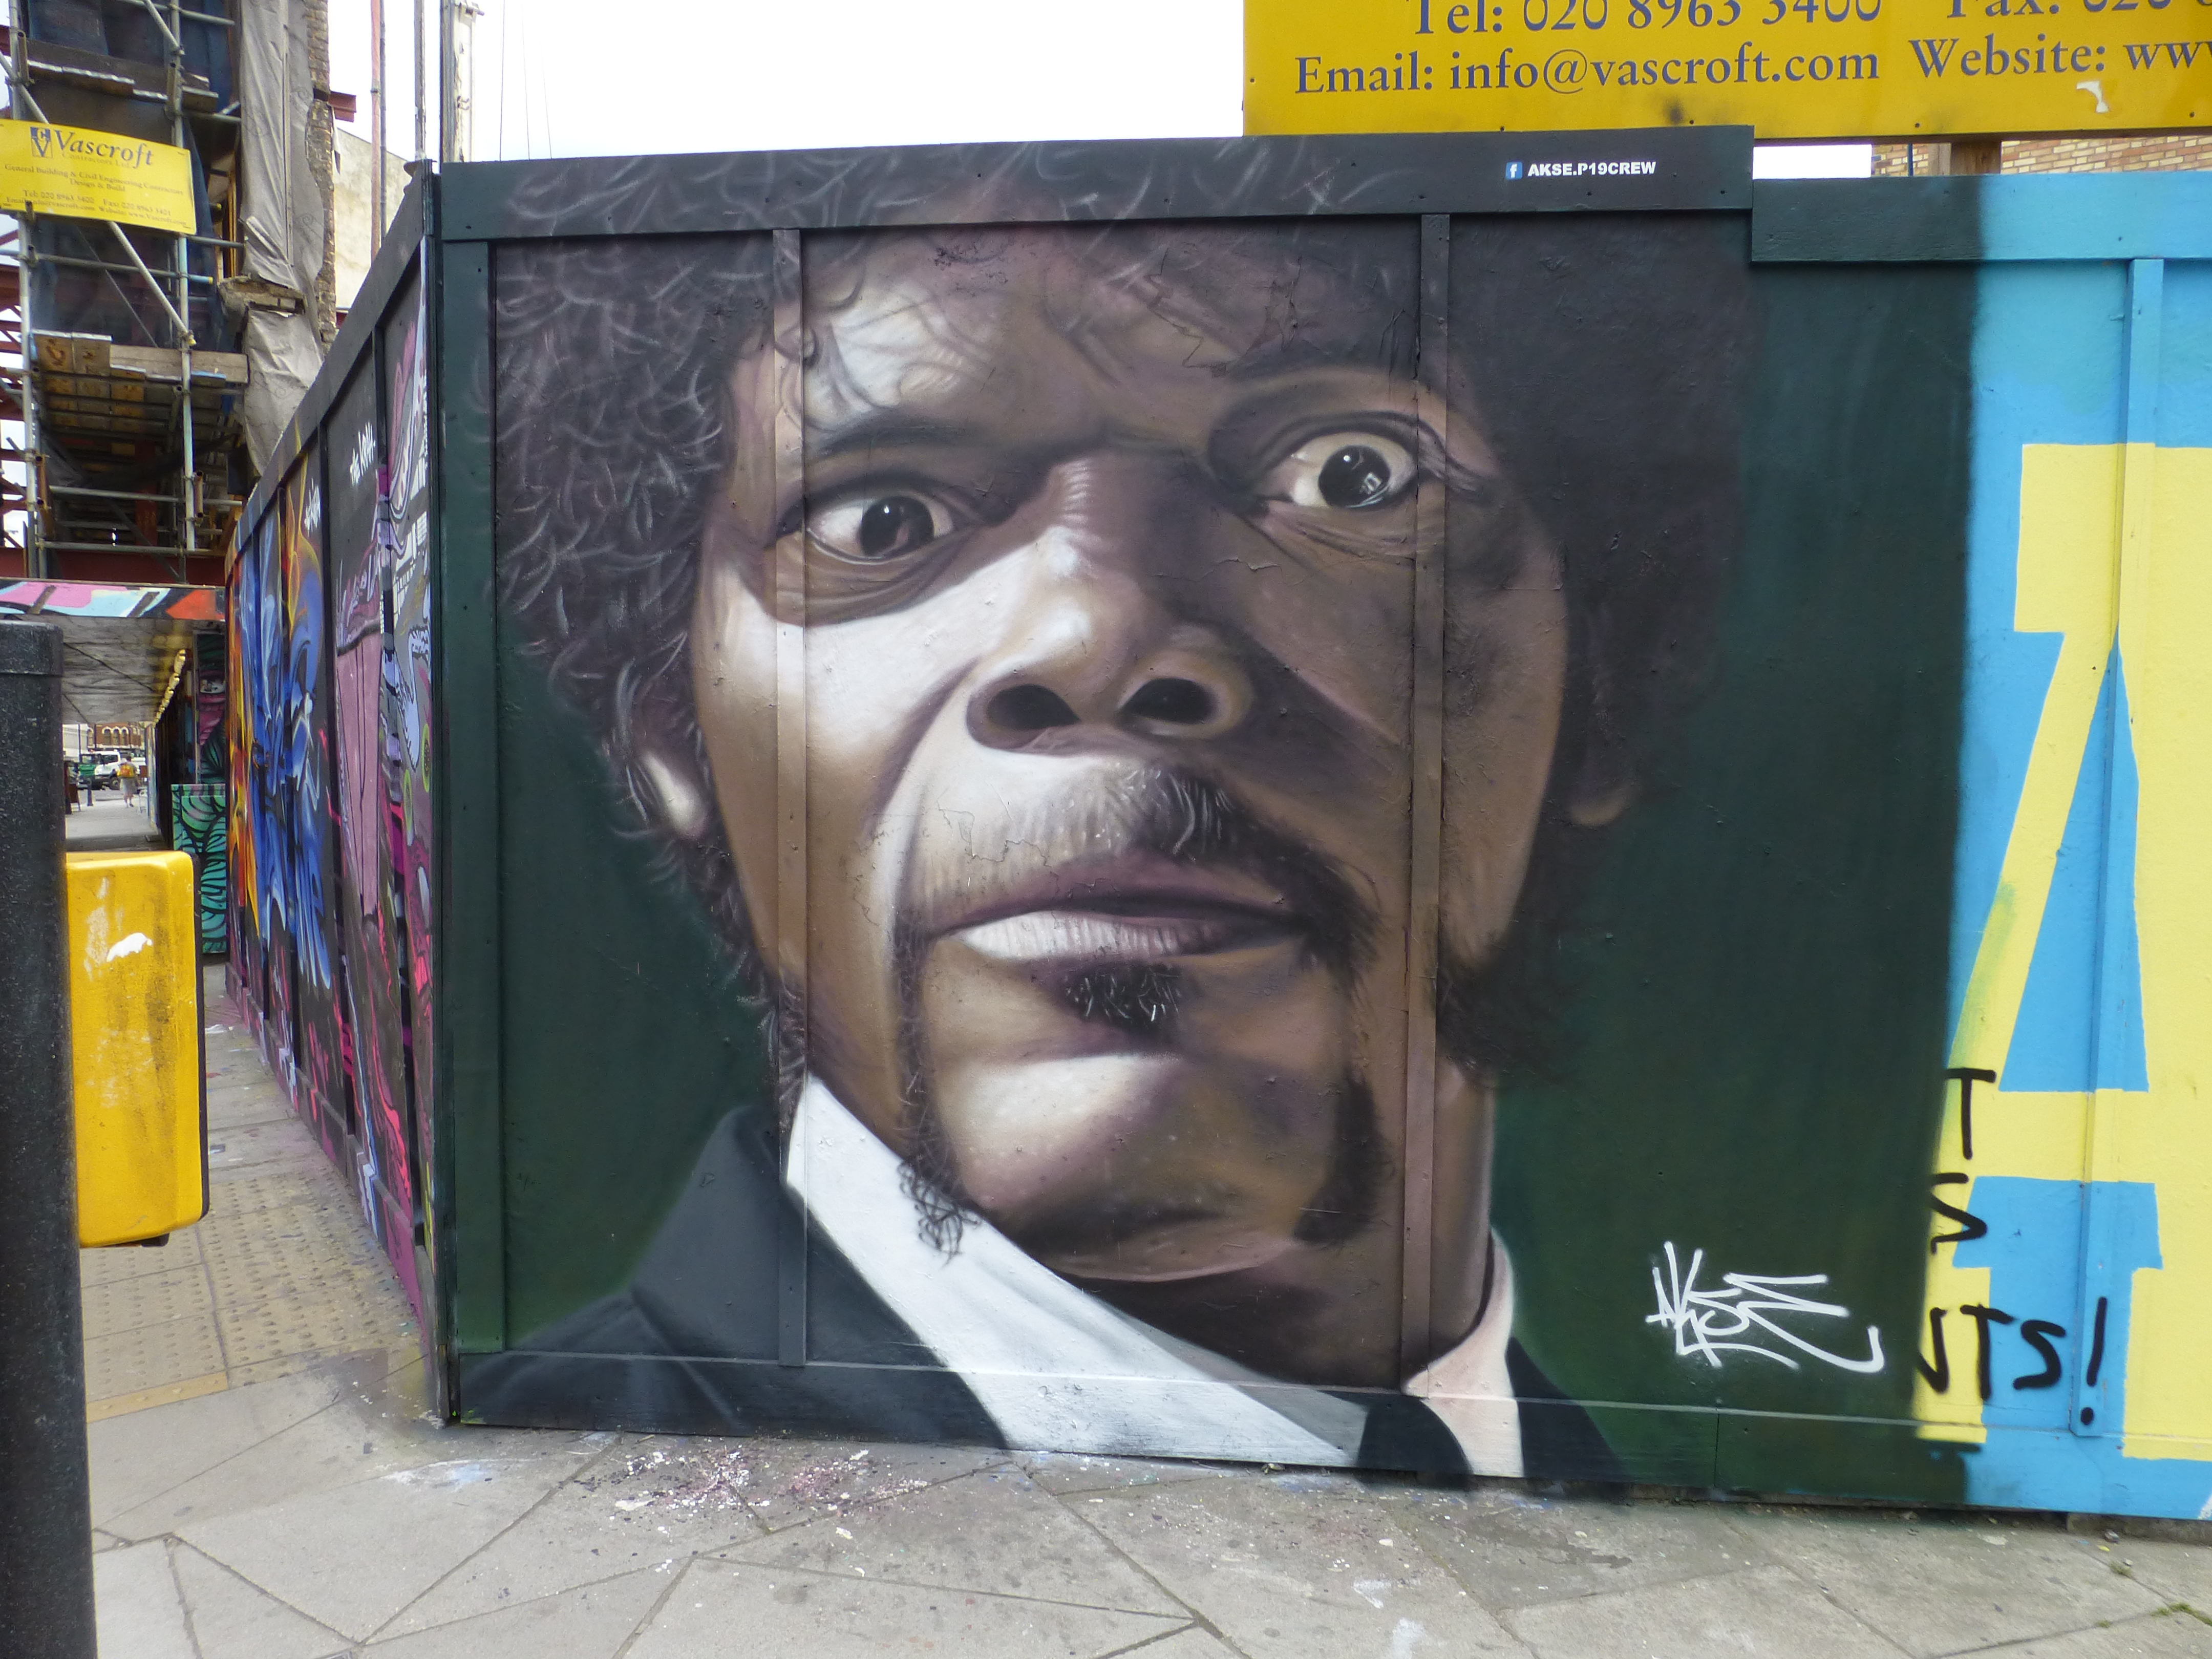 HQ Pulp Fiction Street Art Wallpapers | File 4909.37Kb